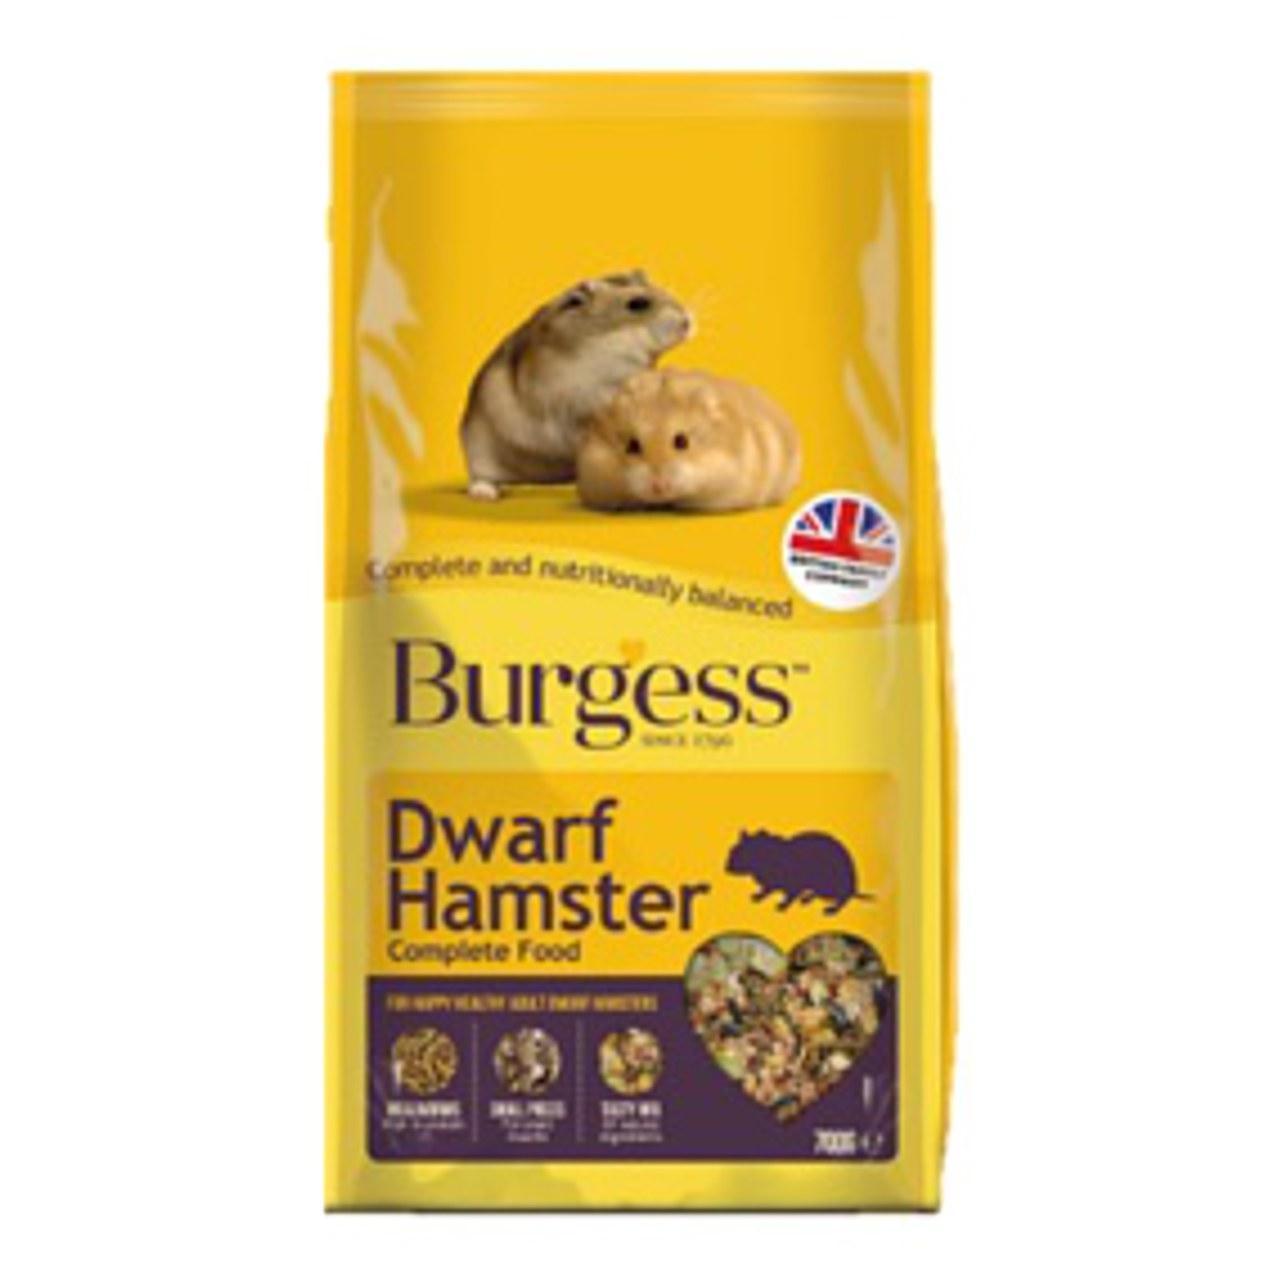 Adult dwarf hamster nudes scene